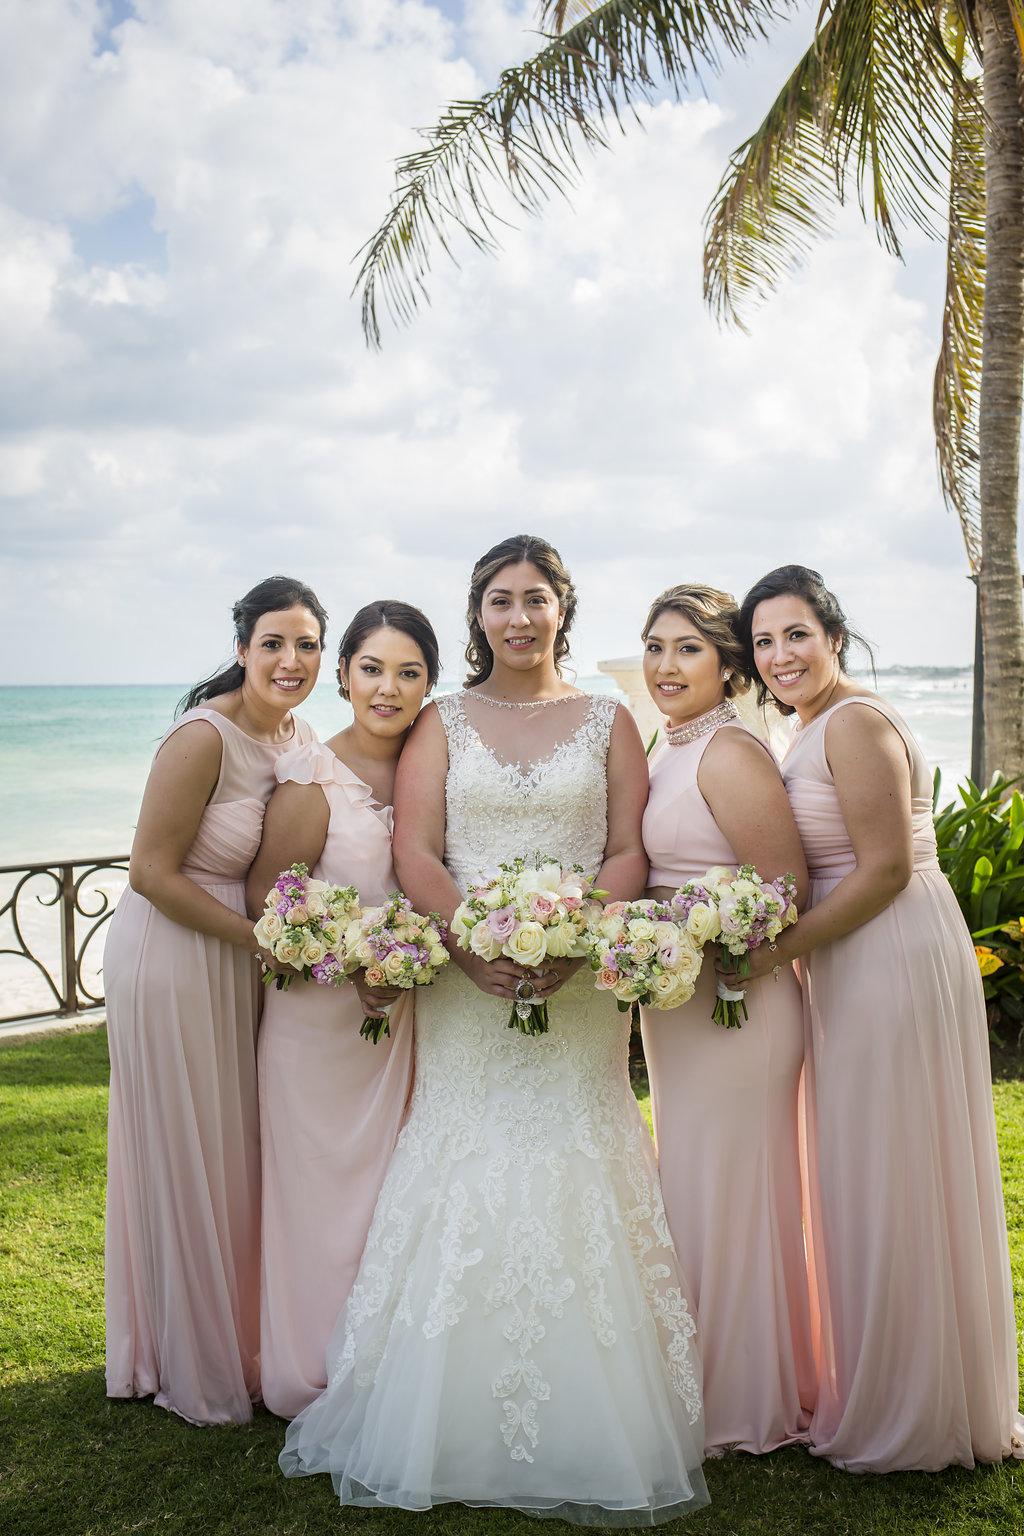 yesica-jose-beach-wedding-Villa-La-Joya--Playa-del-carmen-01--15.jpg